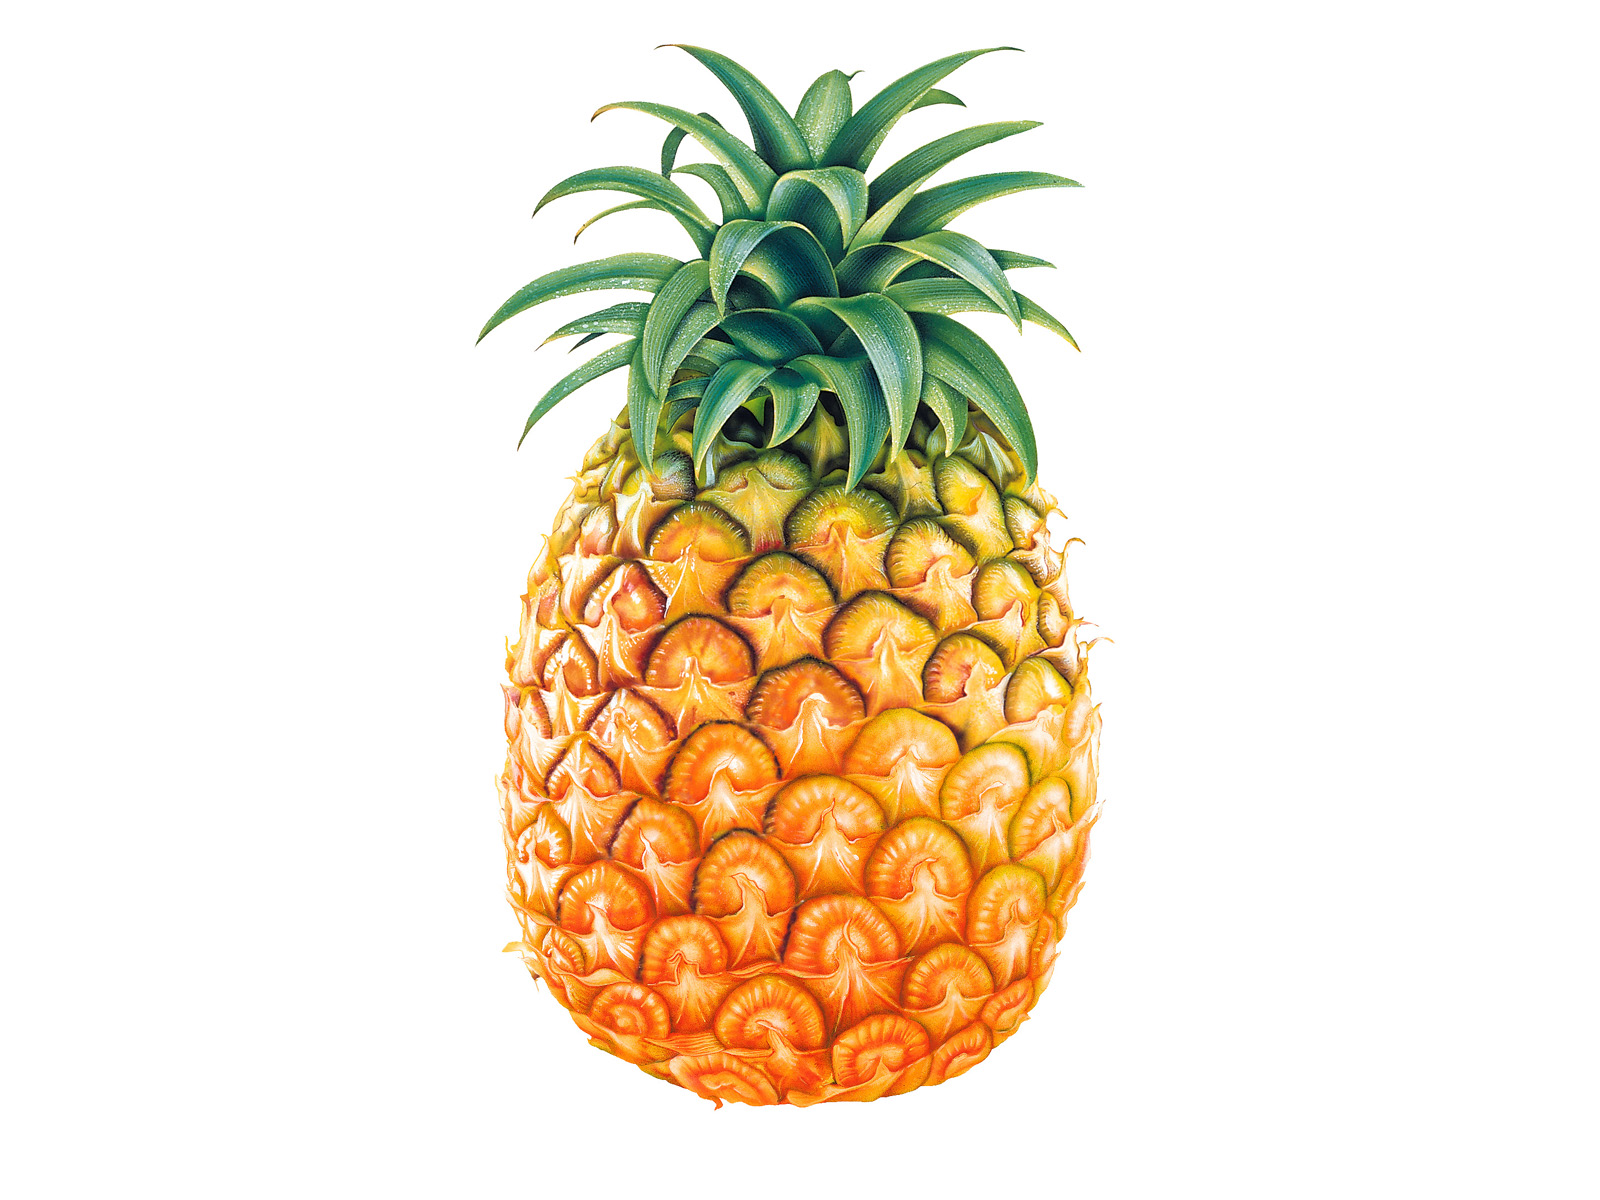 1600x1200 pineapple clip art free clipart black white